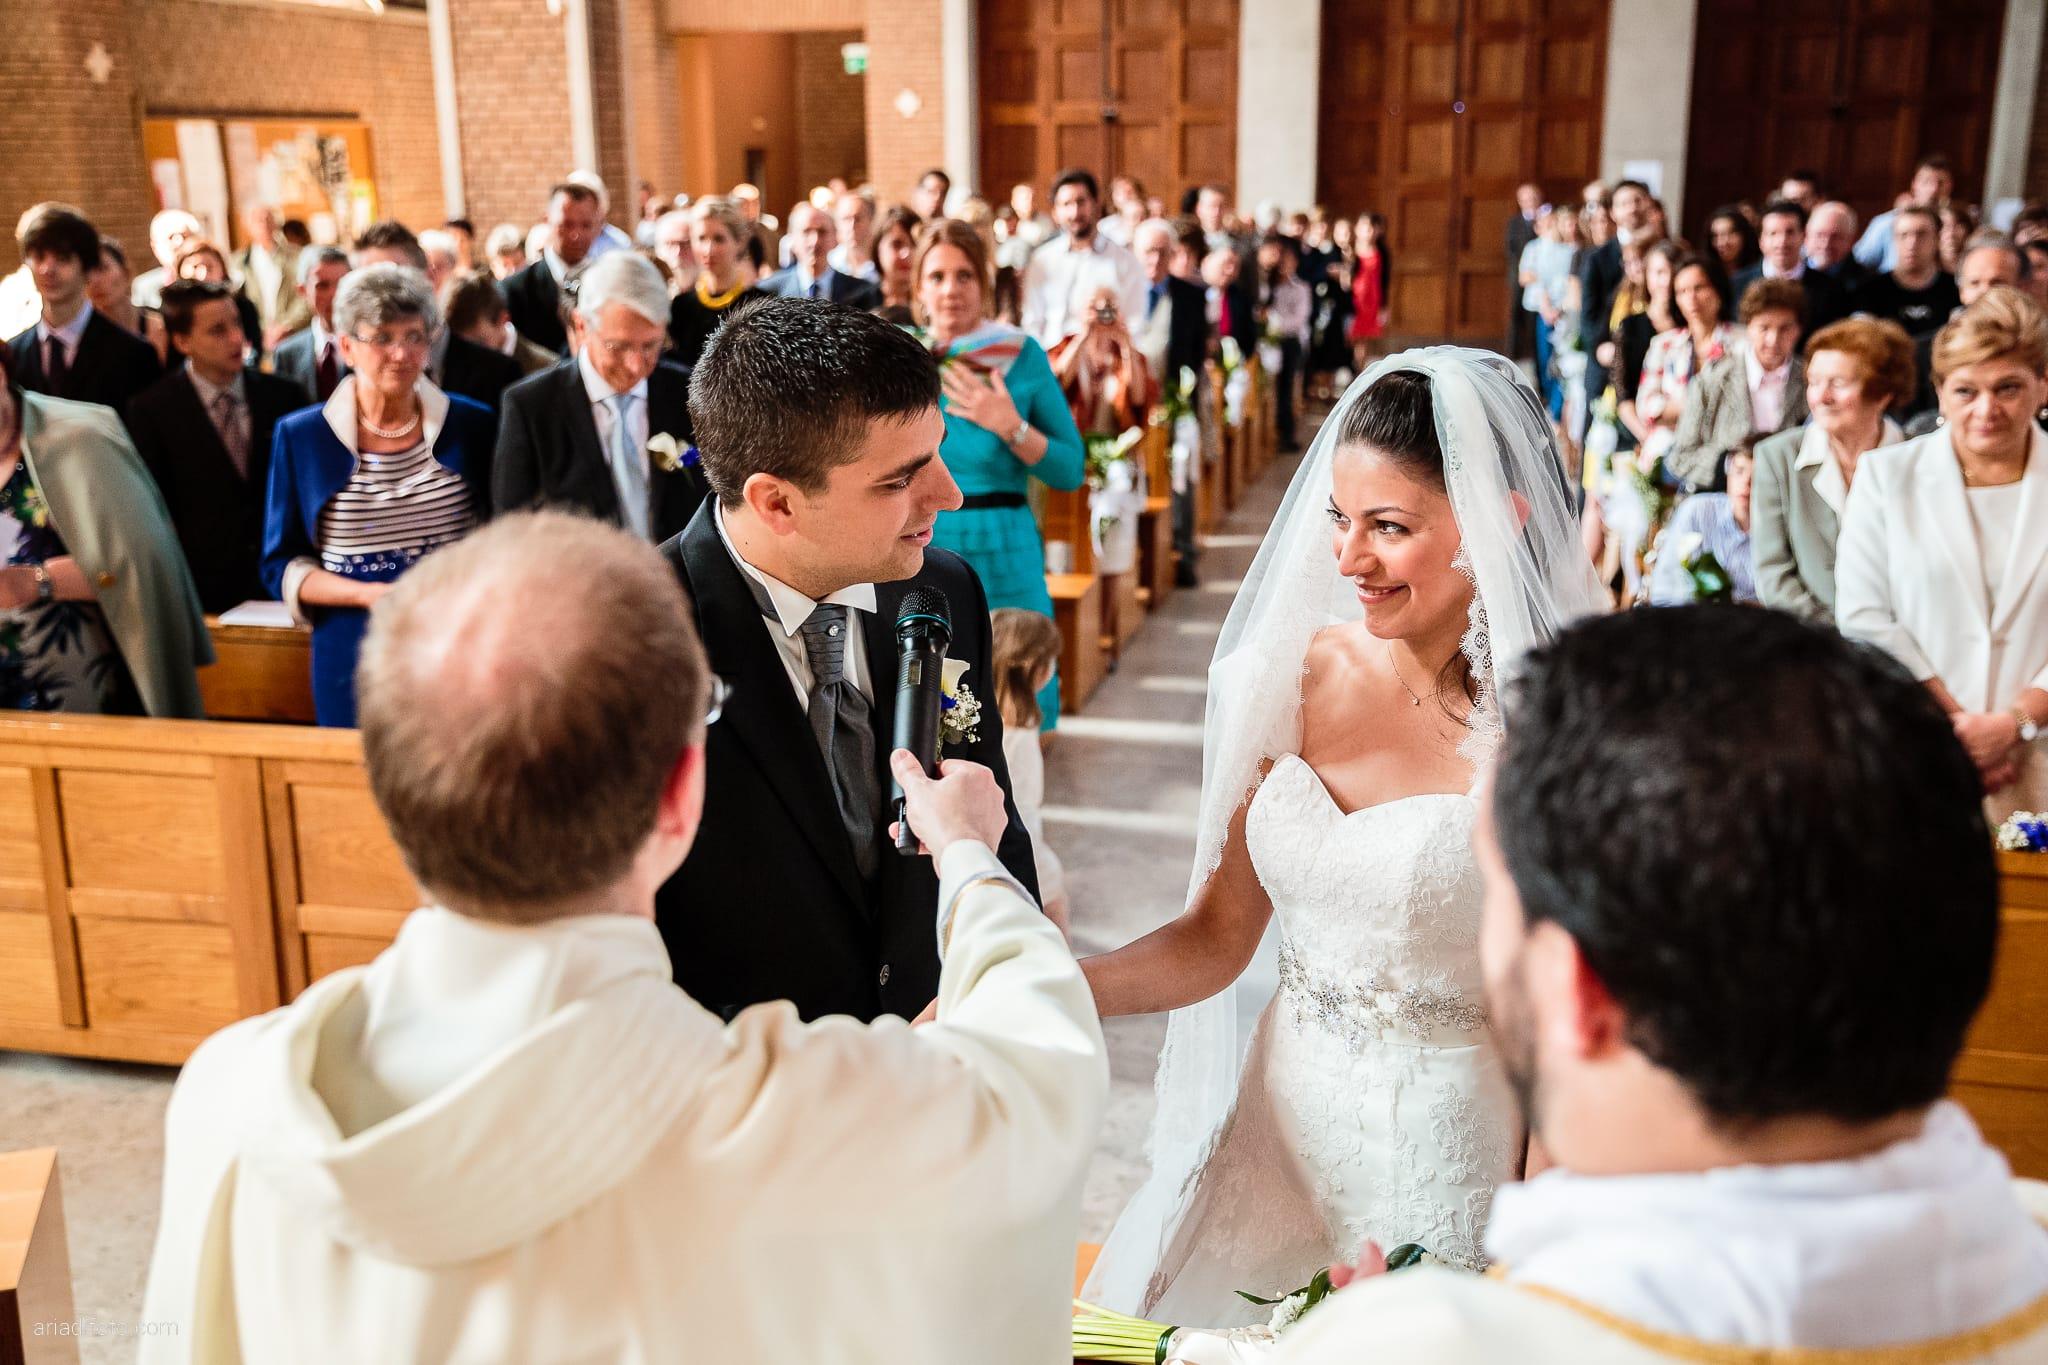 Fiordaliso Andrea matrimonio Salvia Rosmarino Trieste cerimonia promesse Beata Vergine delle Grazie